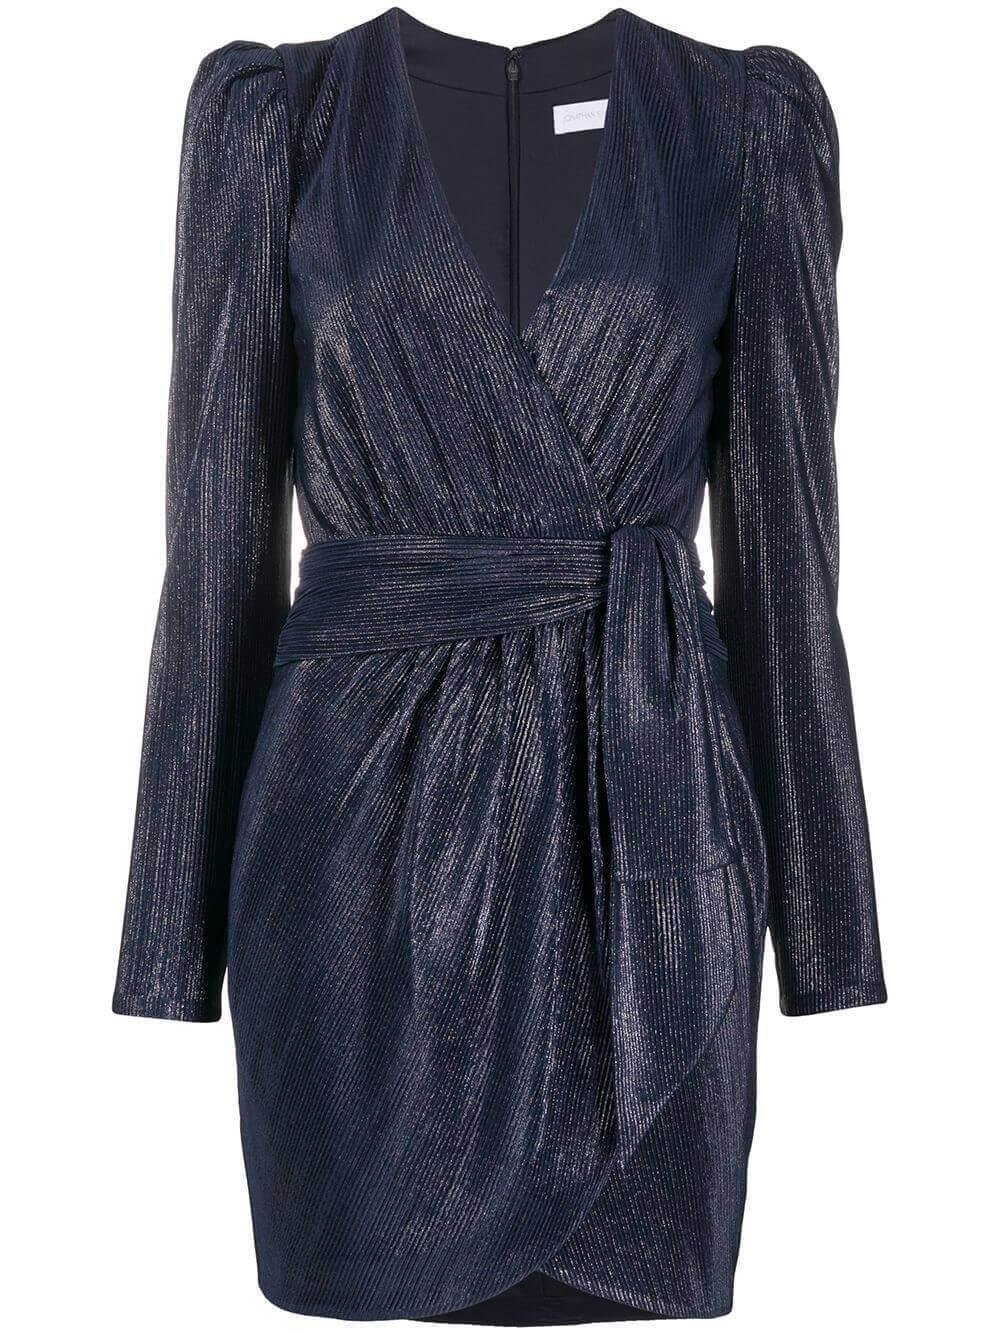 Long Sleeve Wrap Mini Dress Item # 420-1072-M